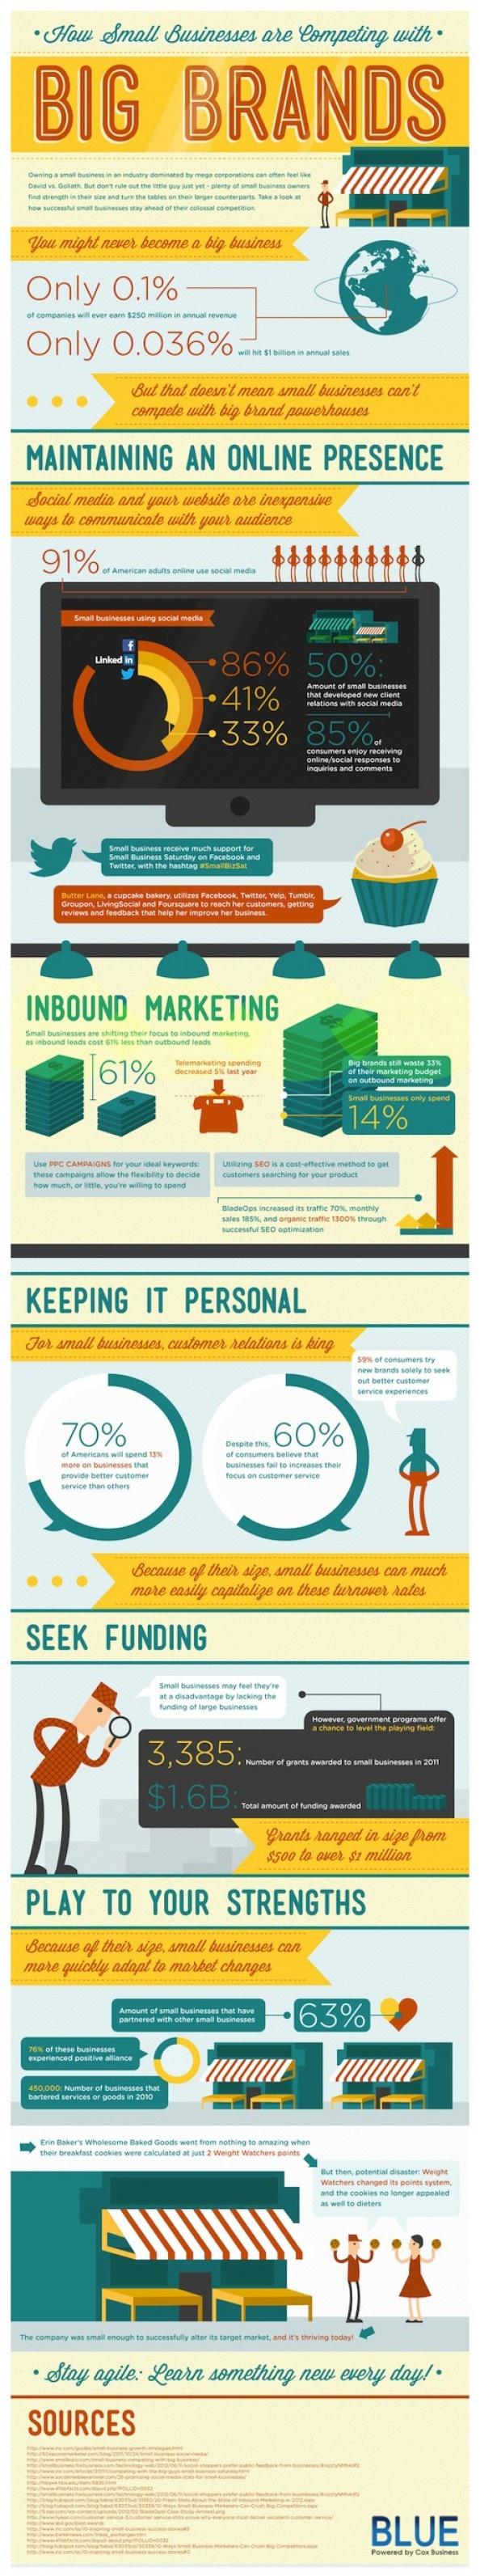 Small Business vs. Big Brands